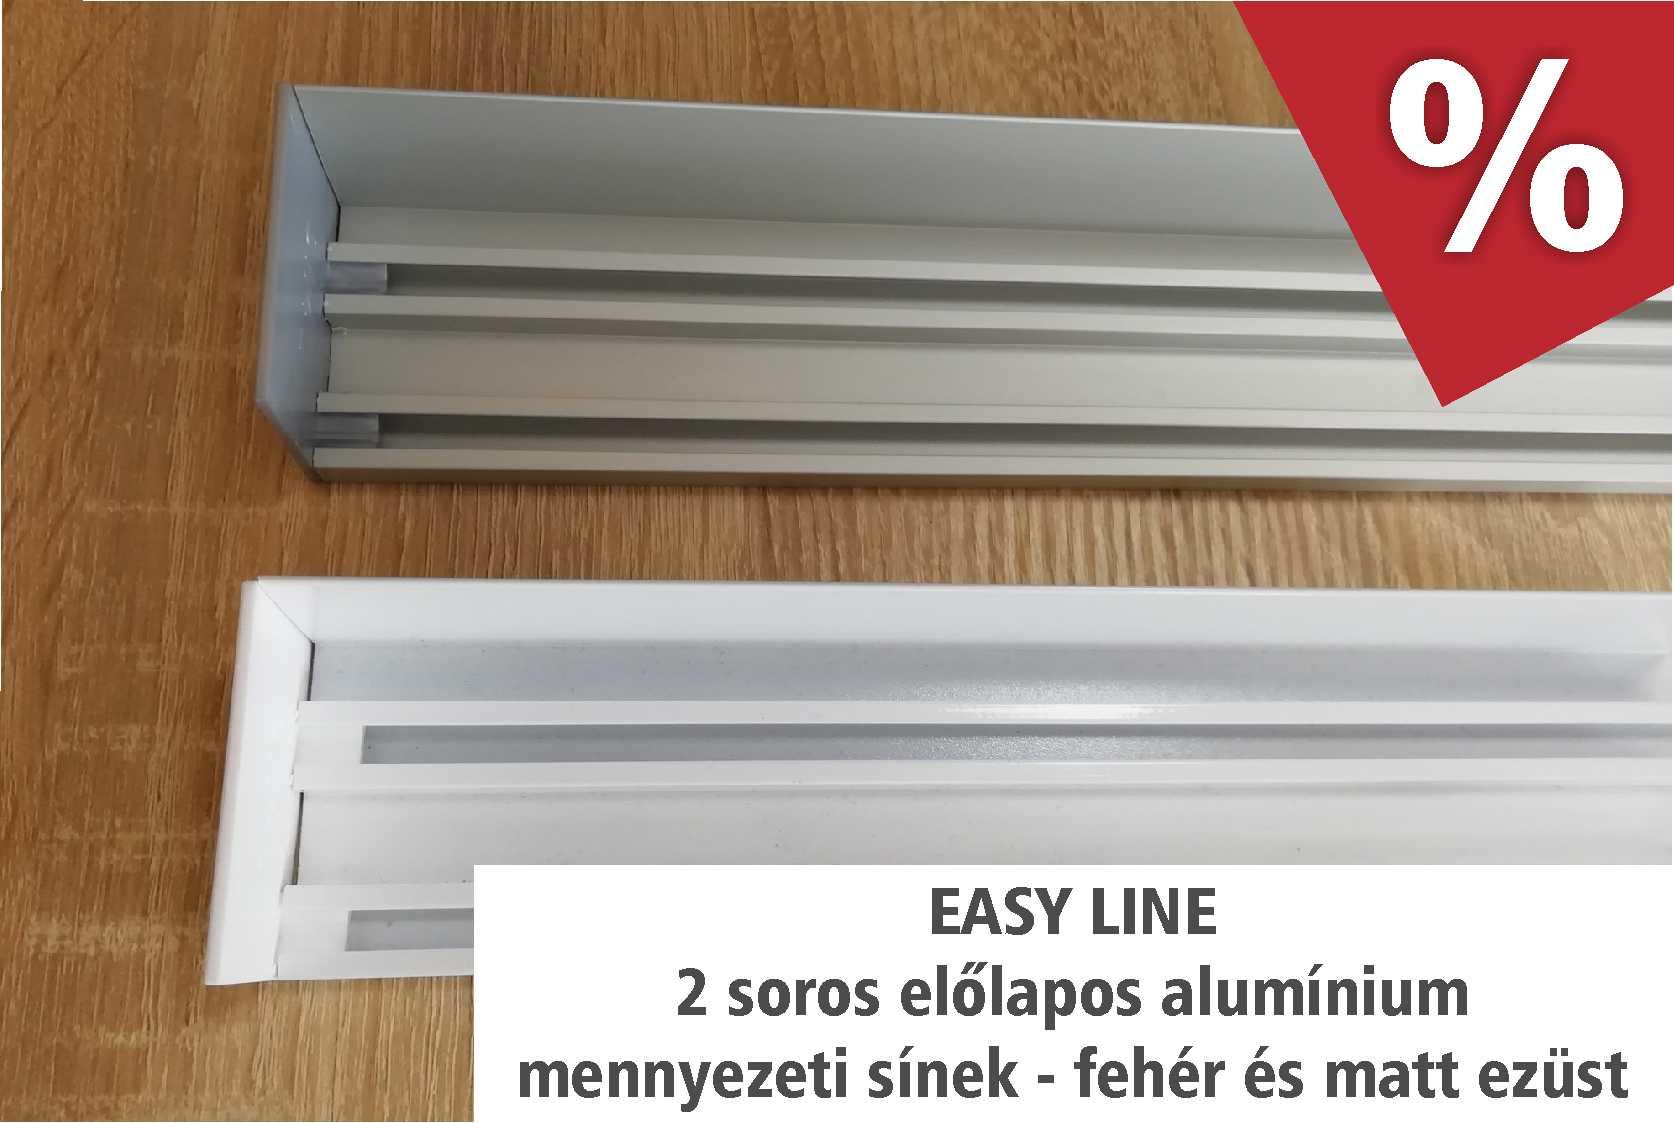 Easy Line előlapos alumínium függönysínek- akciós áron áprilisban - www.karnisstudio.hu